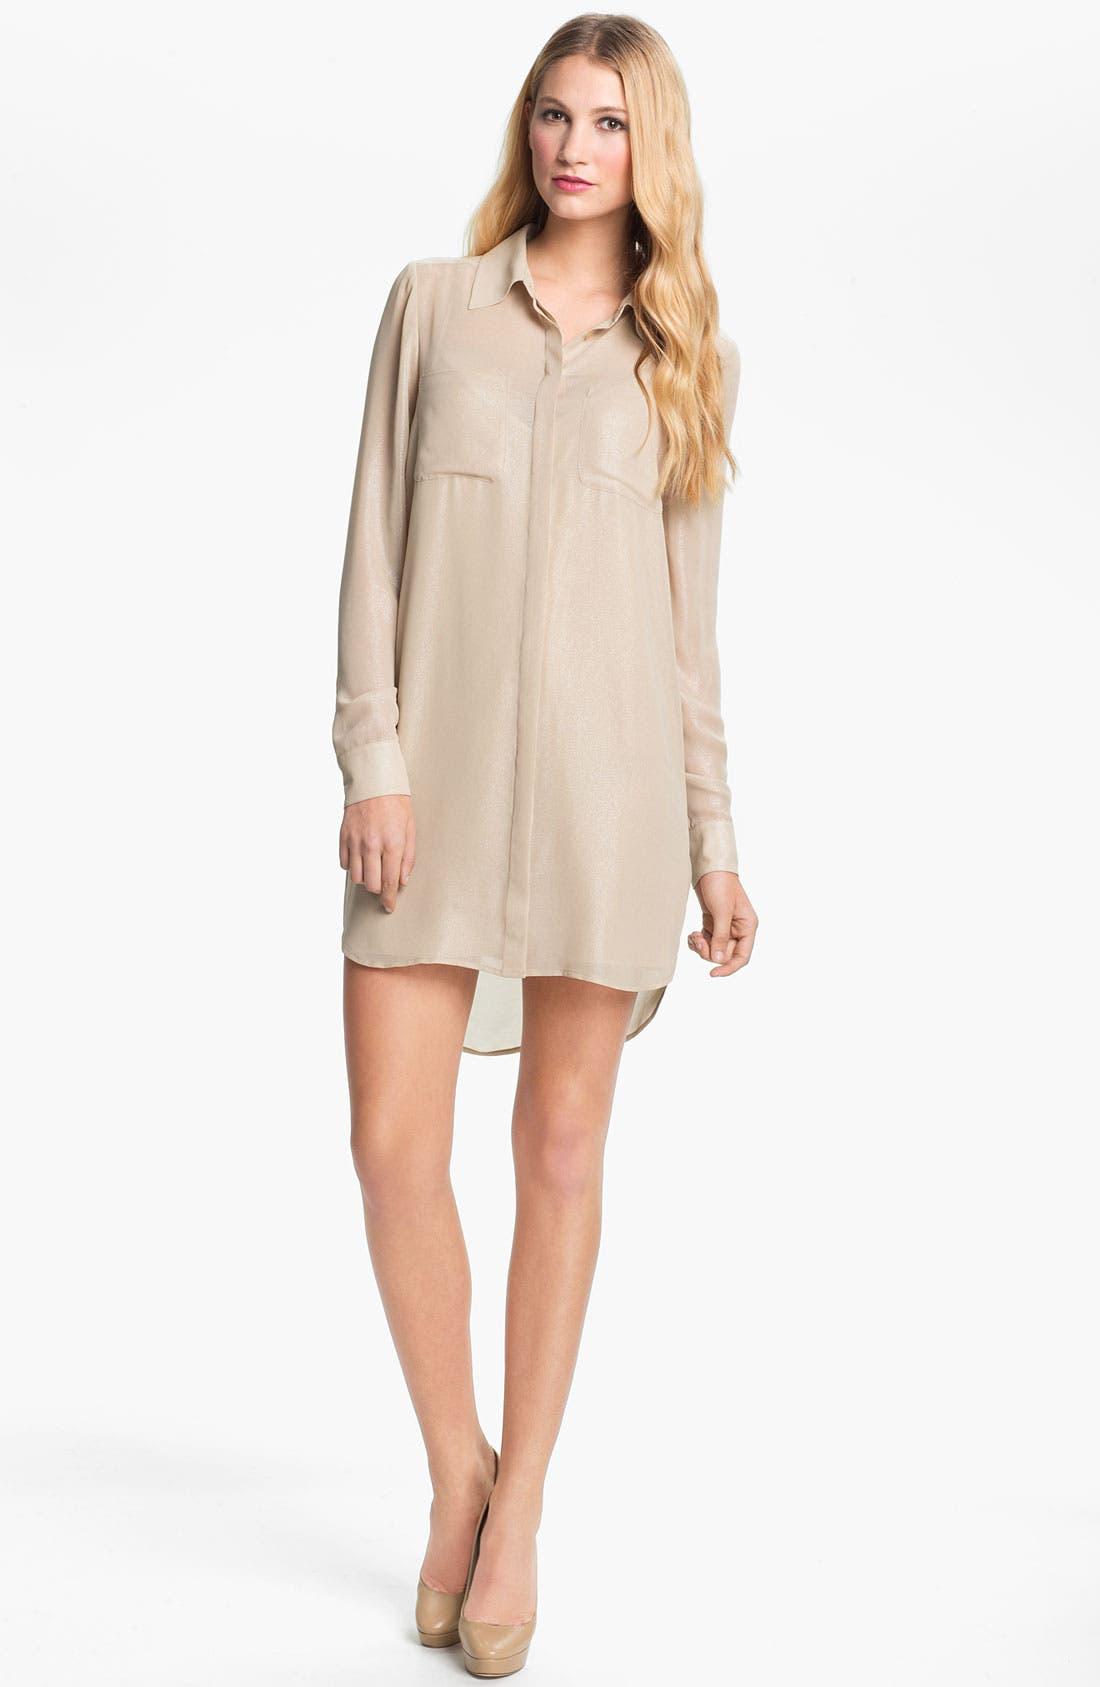 Alternate Image 1 Selected - Haute Hippie 'Sylvia' Chiffon Shirtdress